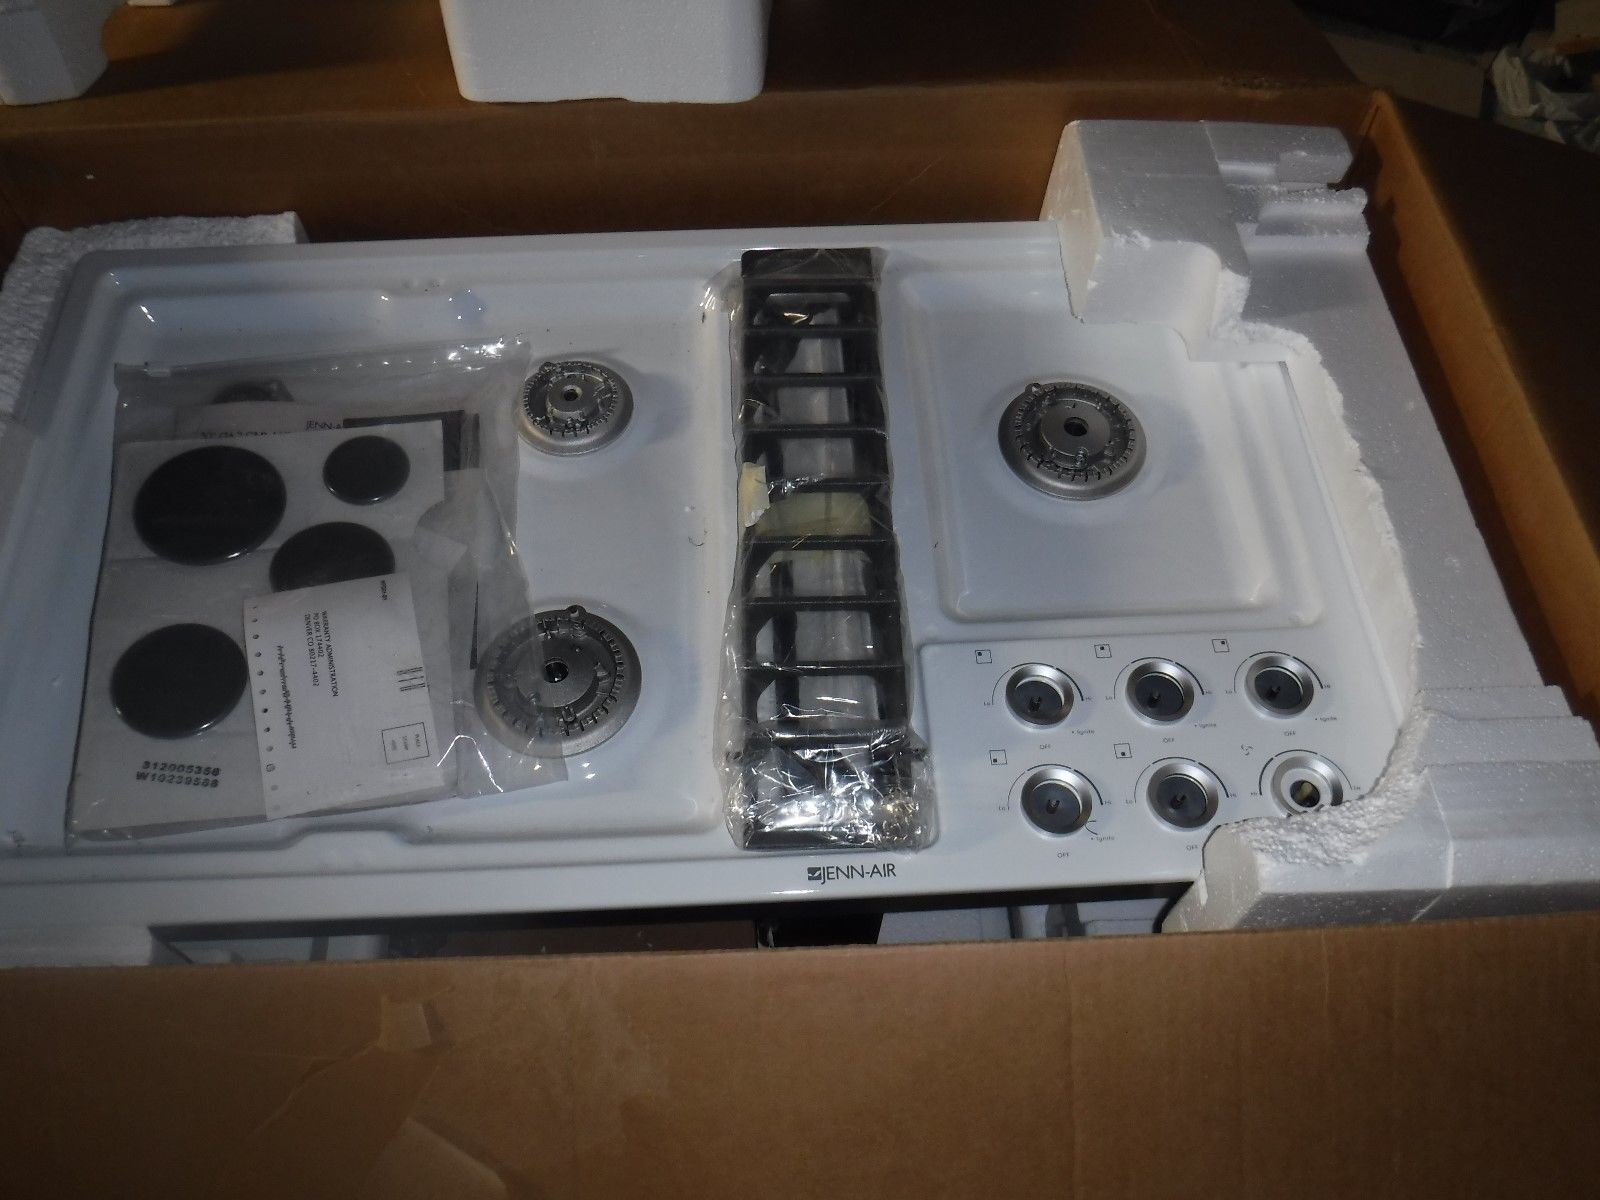 jenn air downdraft gas cooktop jgd3536bw00 white 36 inch